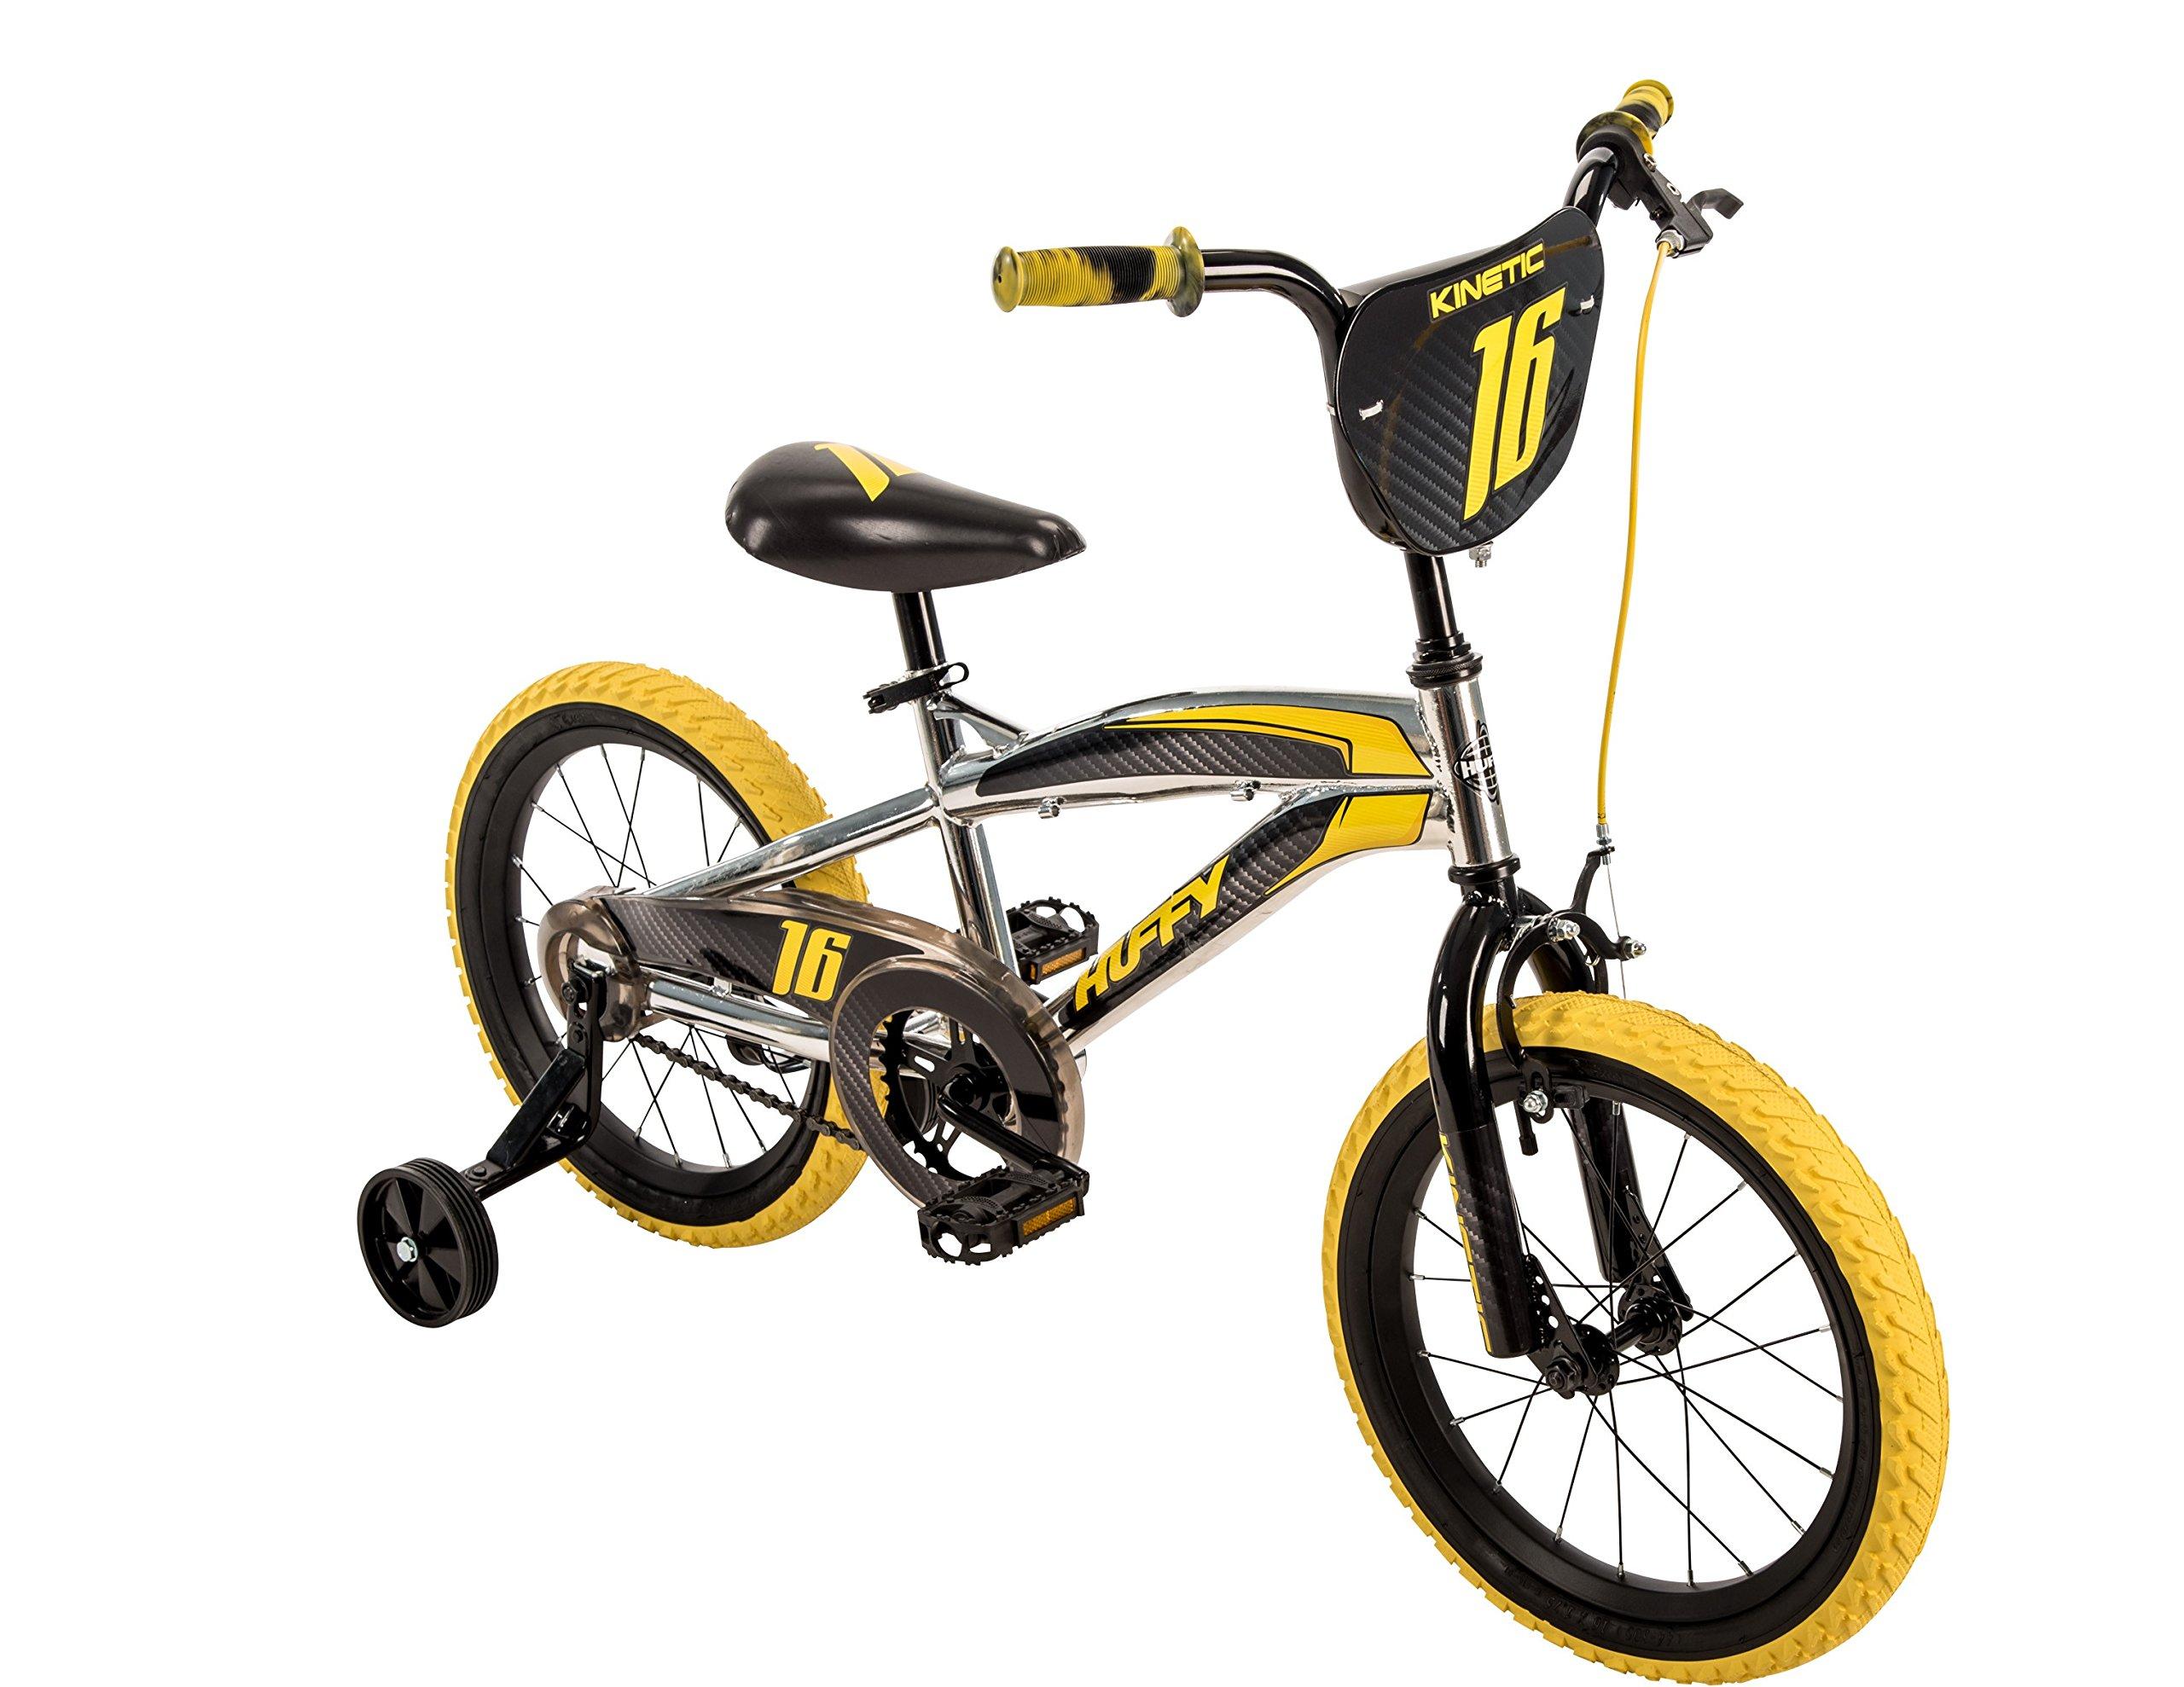 16'' Huffy Kinetic Kid Bike, Yellow w/ Removable Training Wheels